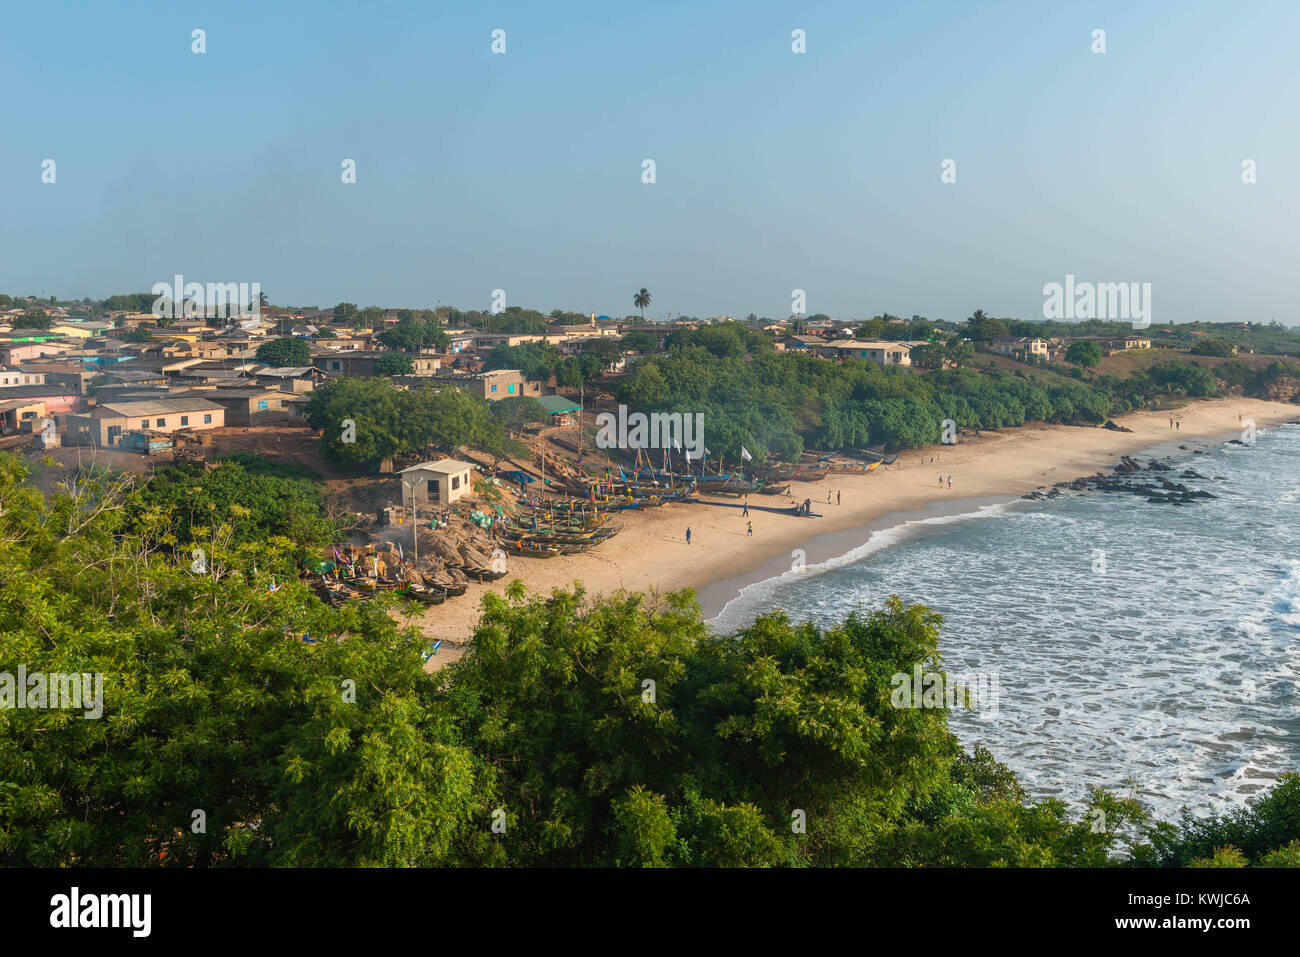 small town of senya beraku, gold coast, central region, ghana